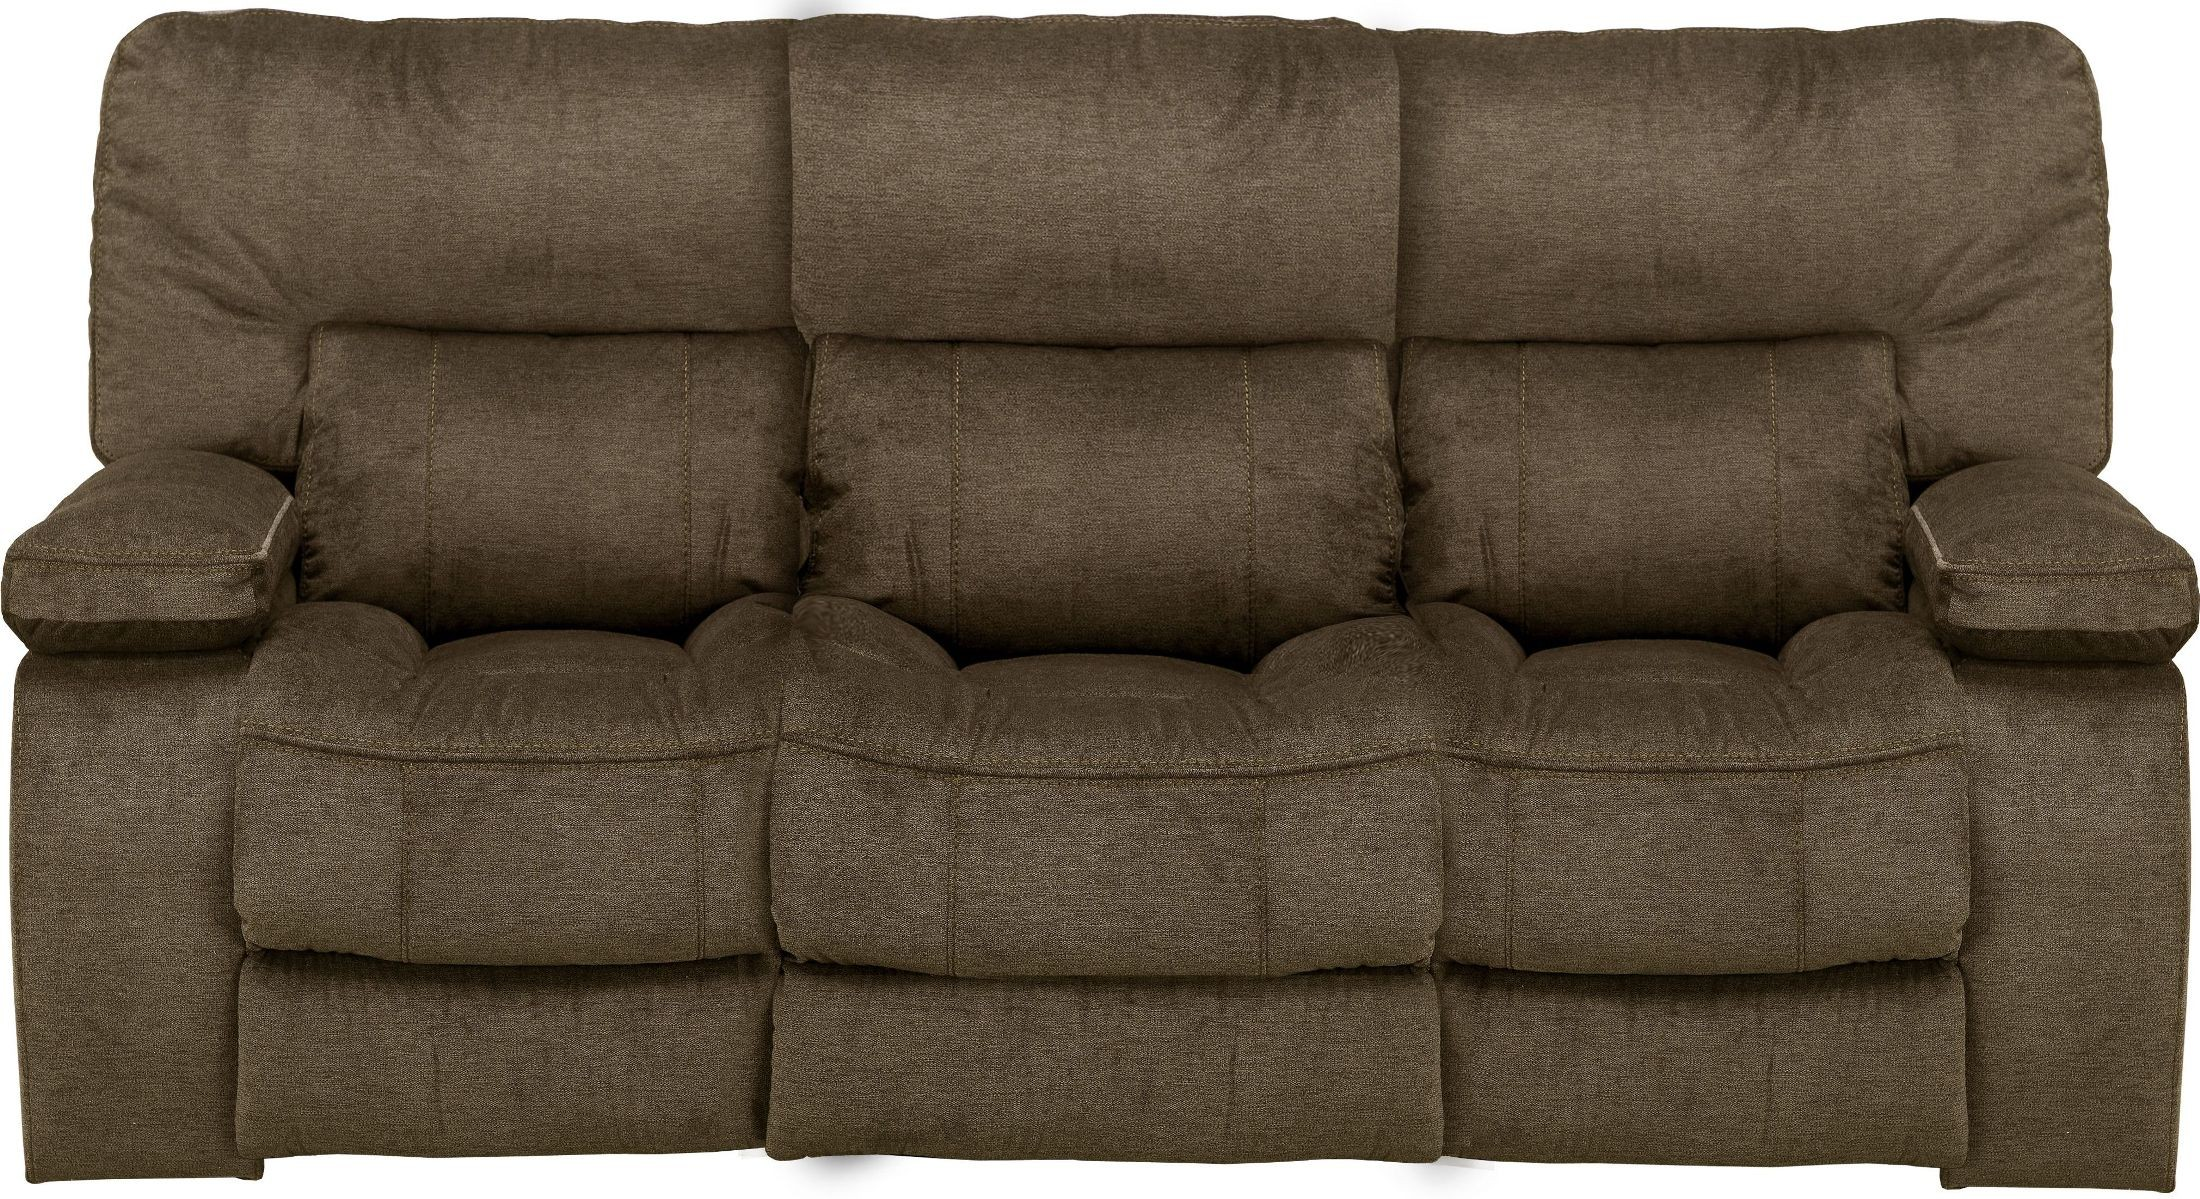 triple reclining sofa best sleeper sofas for bad backs chapman kona from parker living